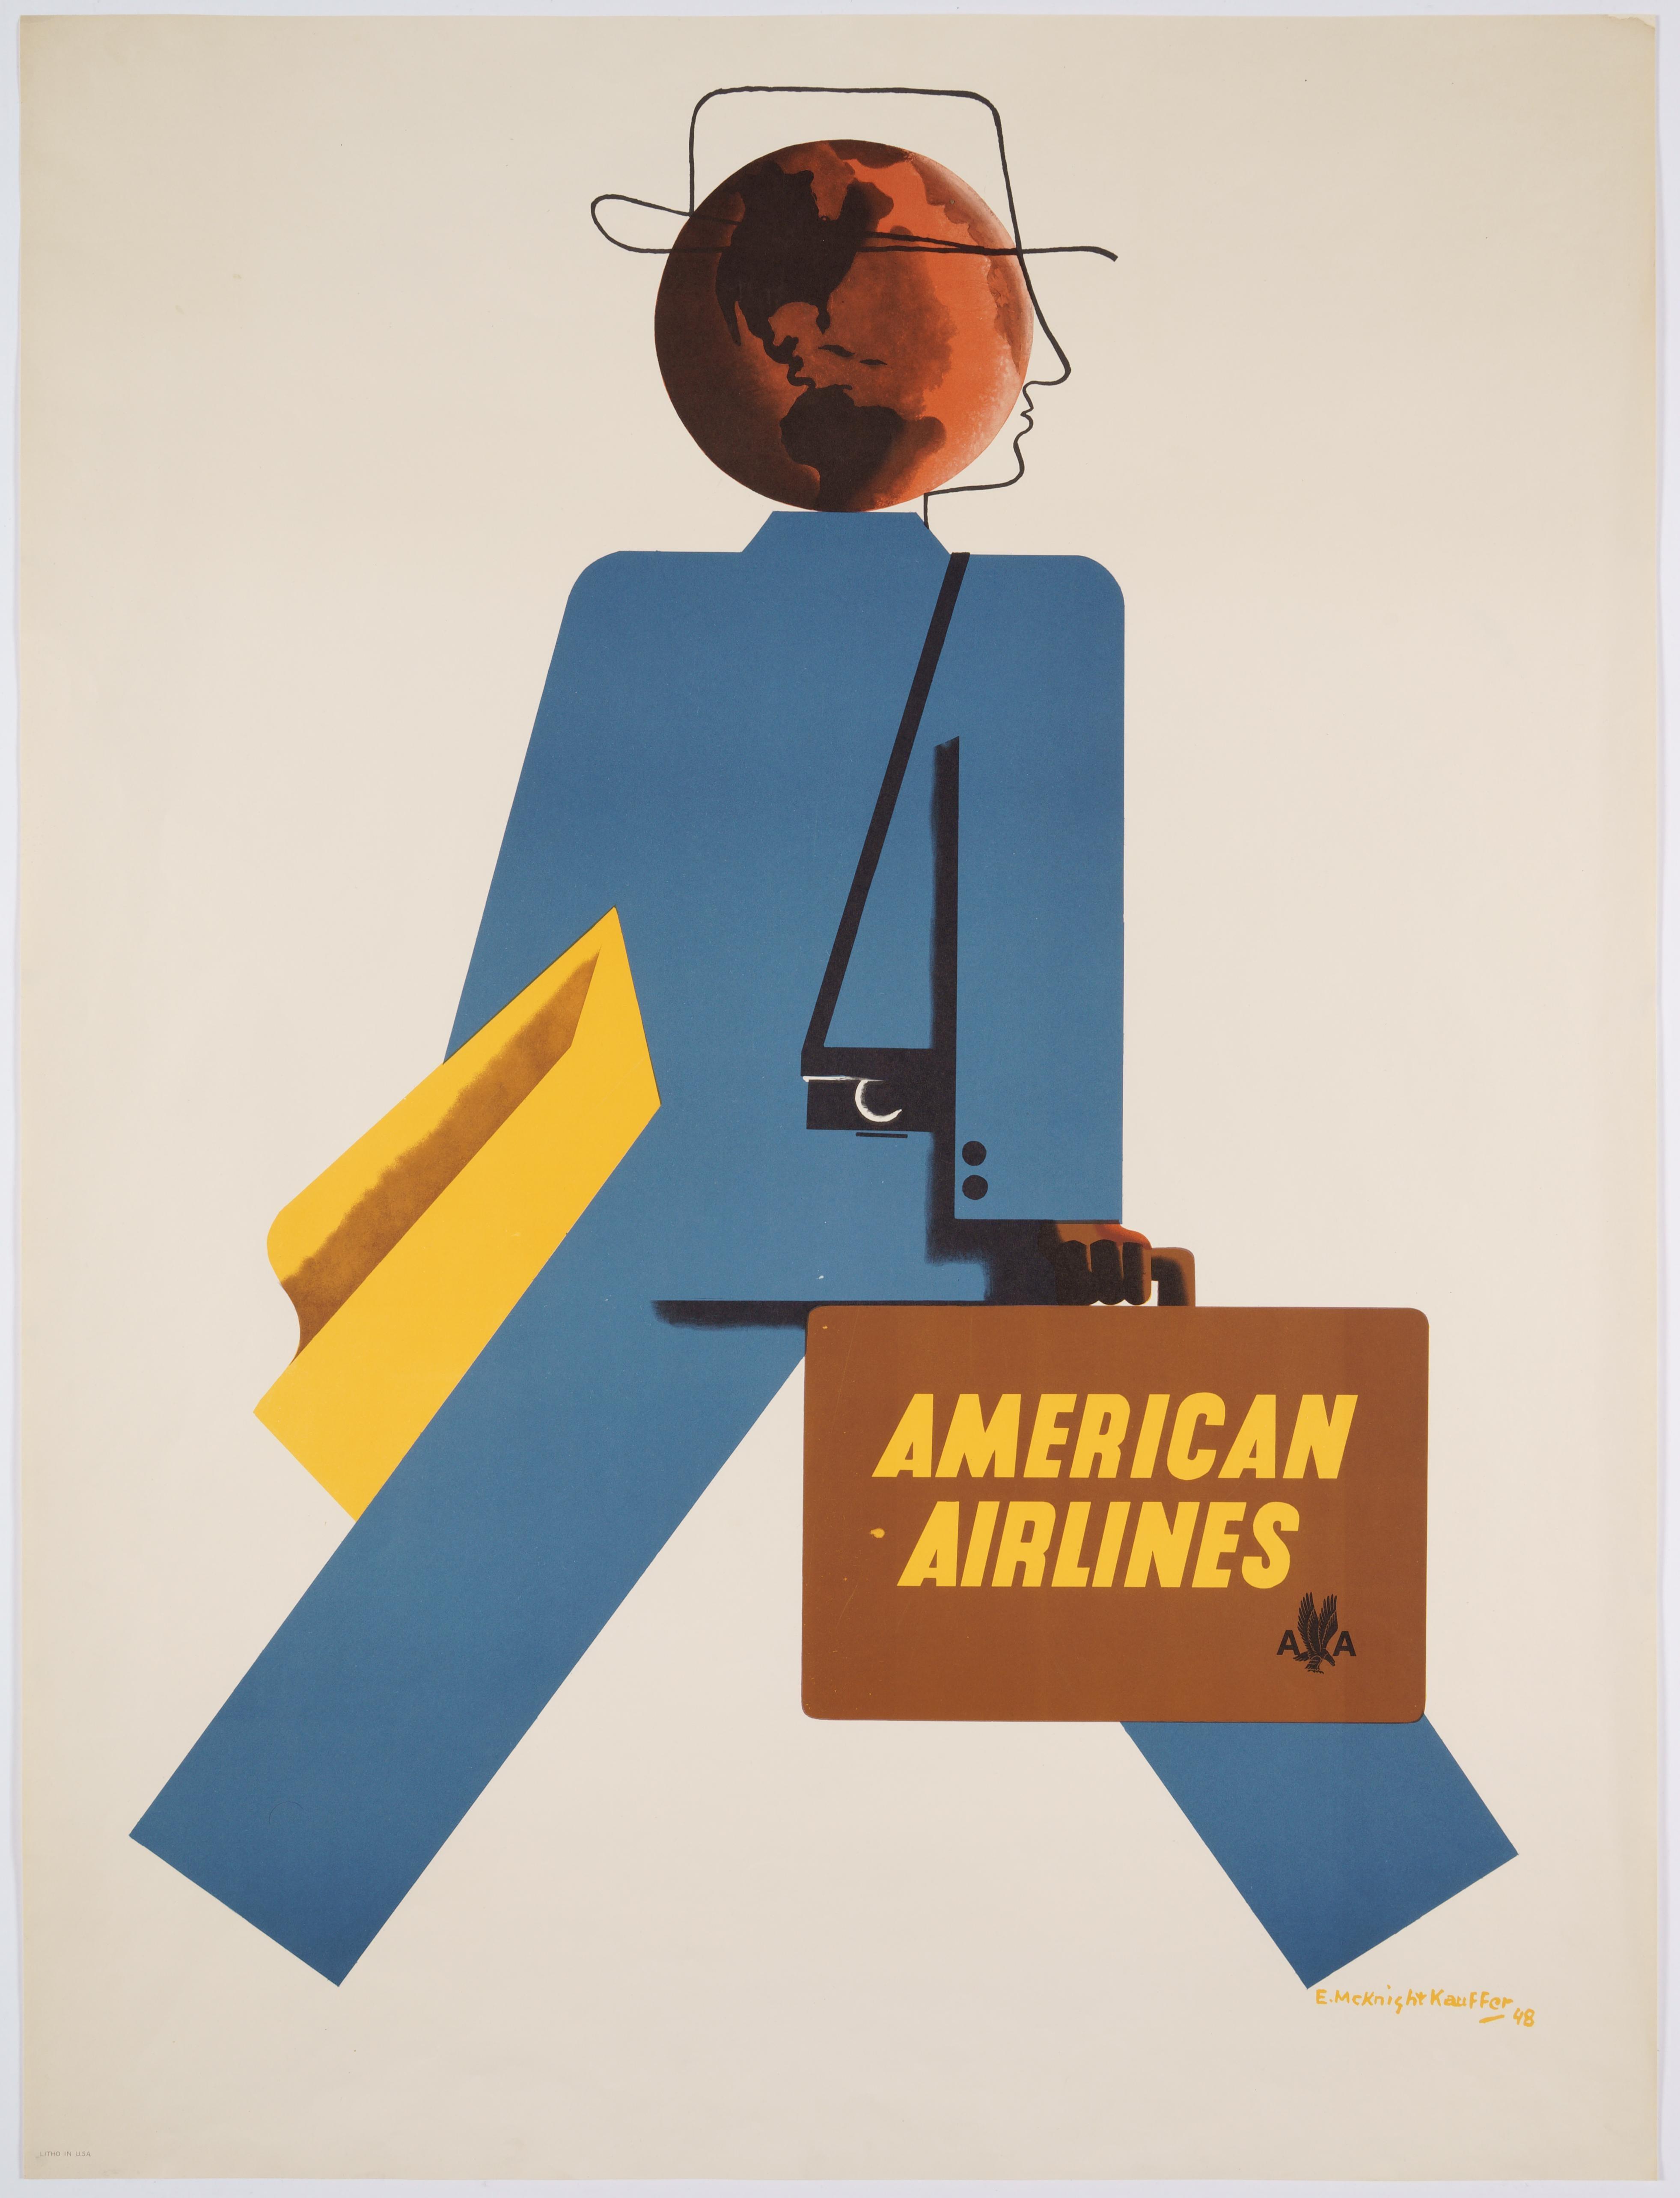 Original Vintage Travel Poster promoting American Airlines, 1948